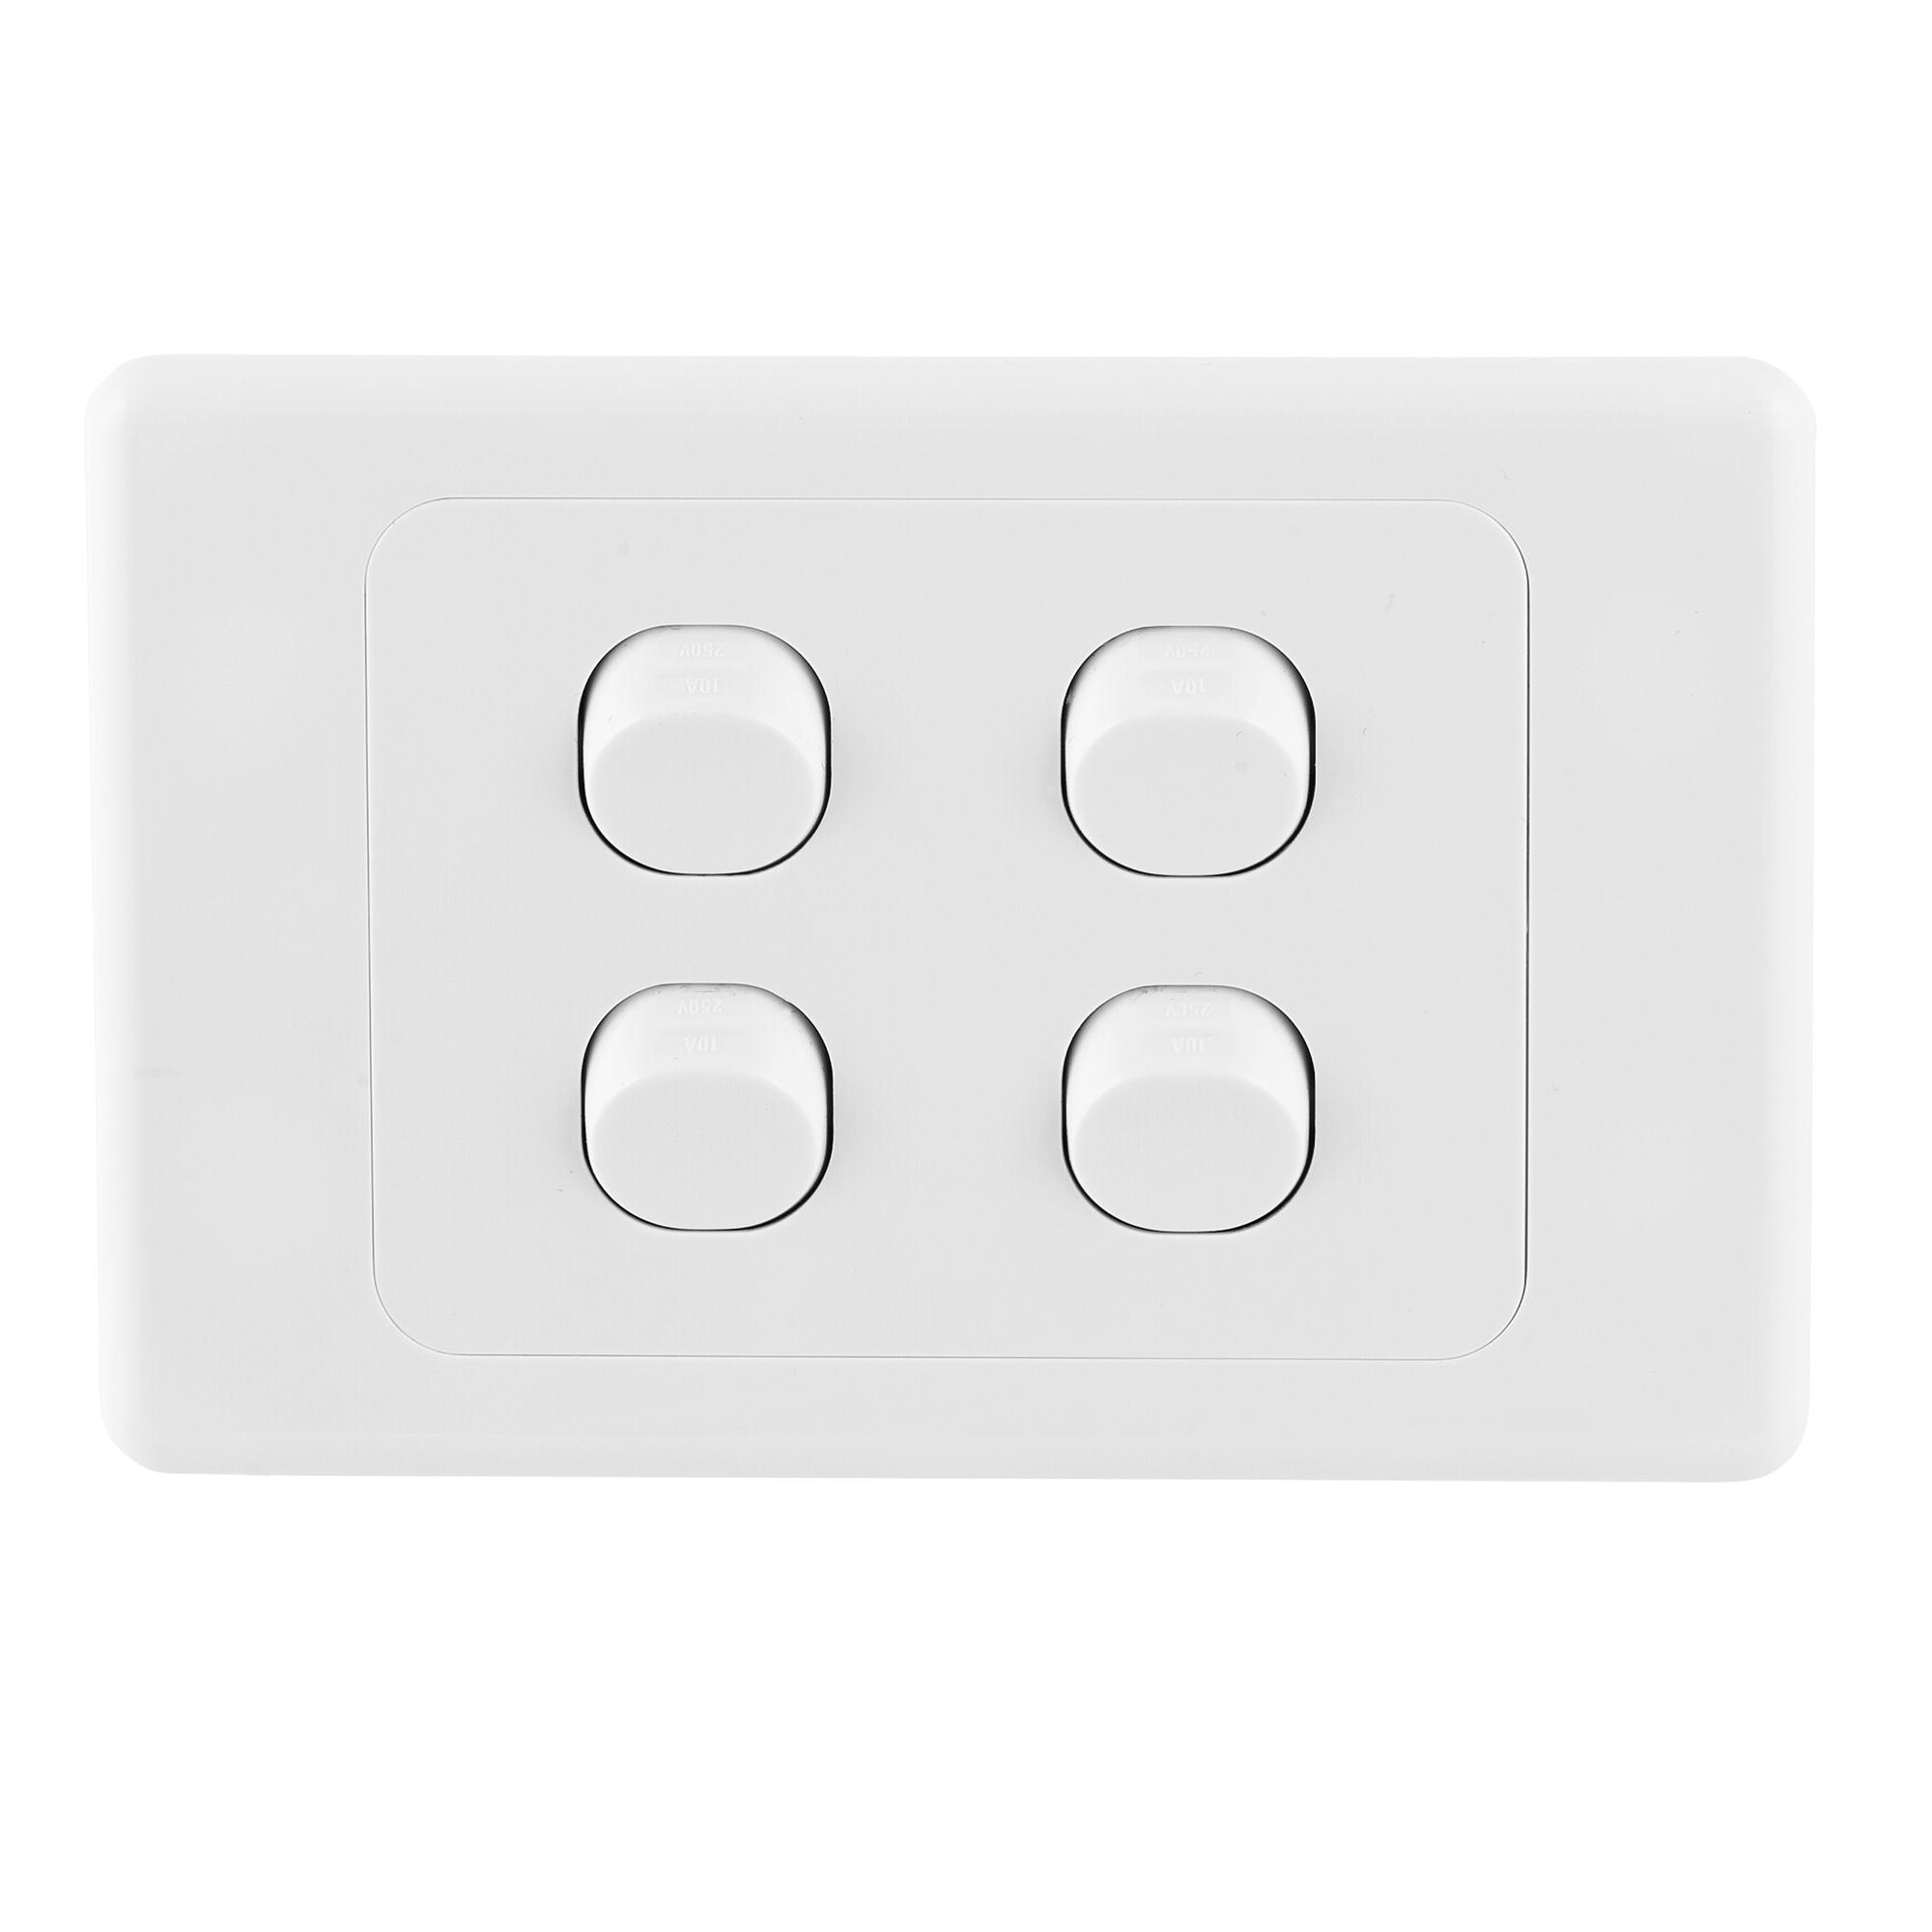 Deta s-line quad switch